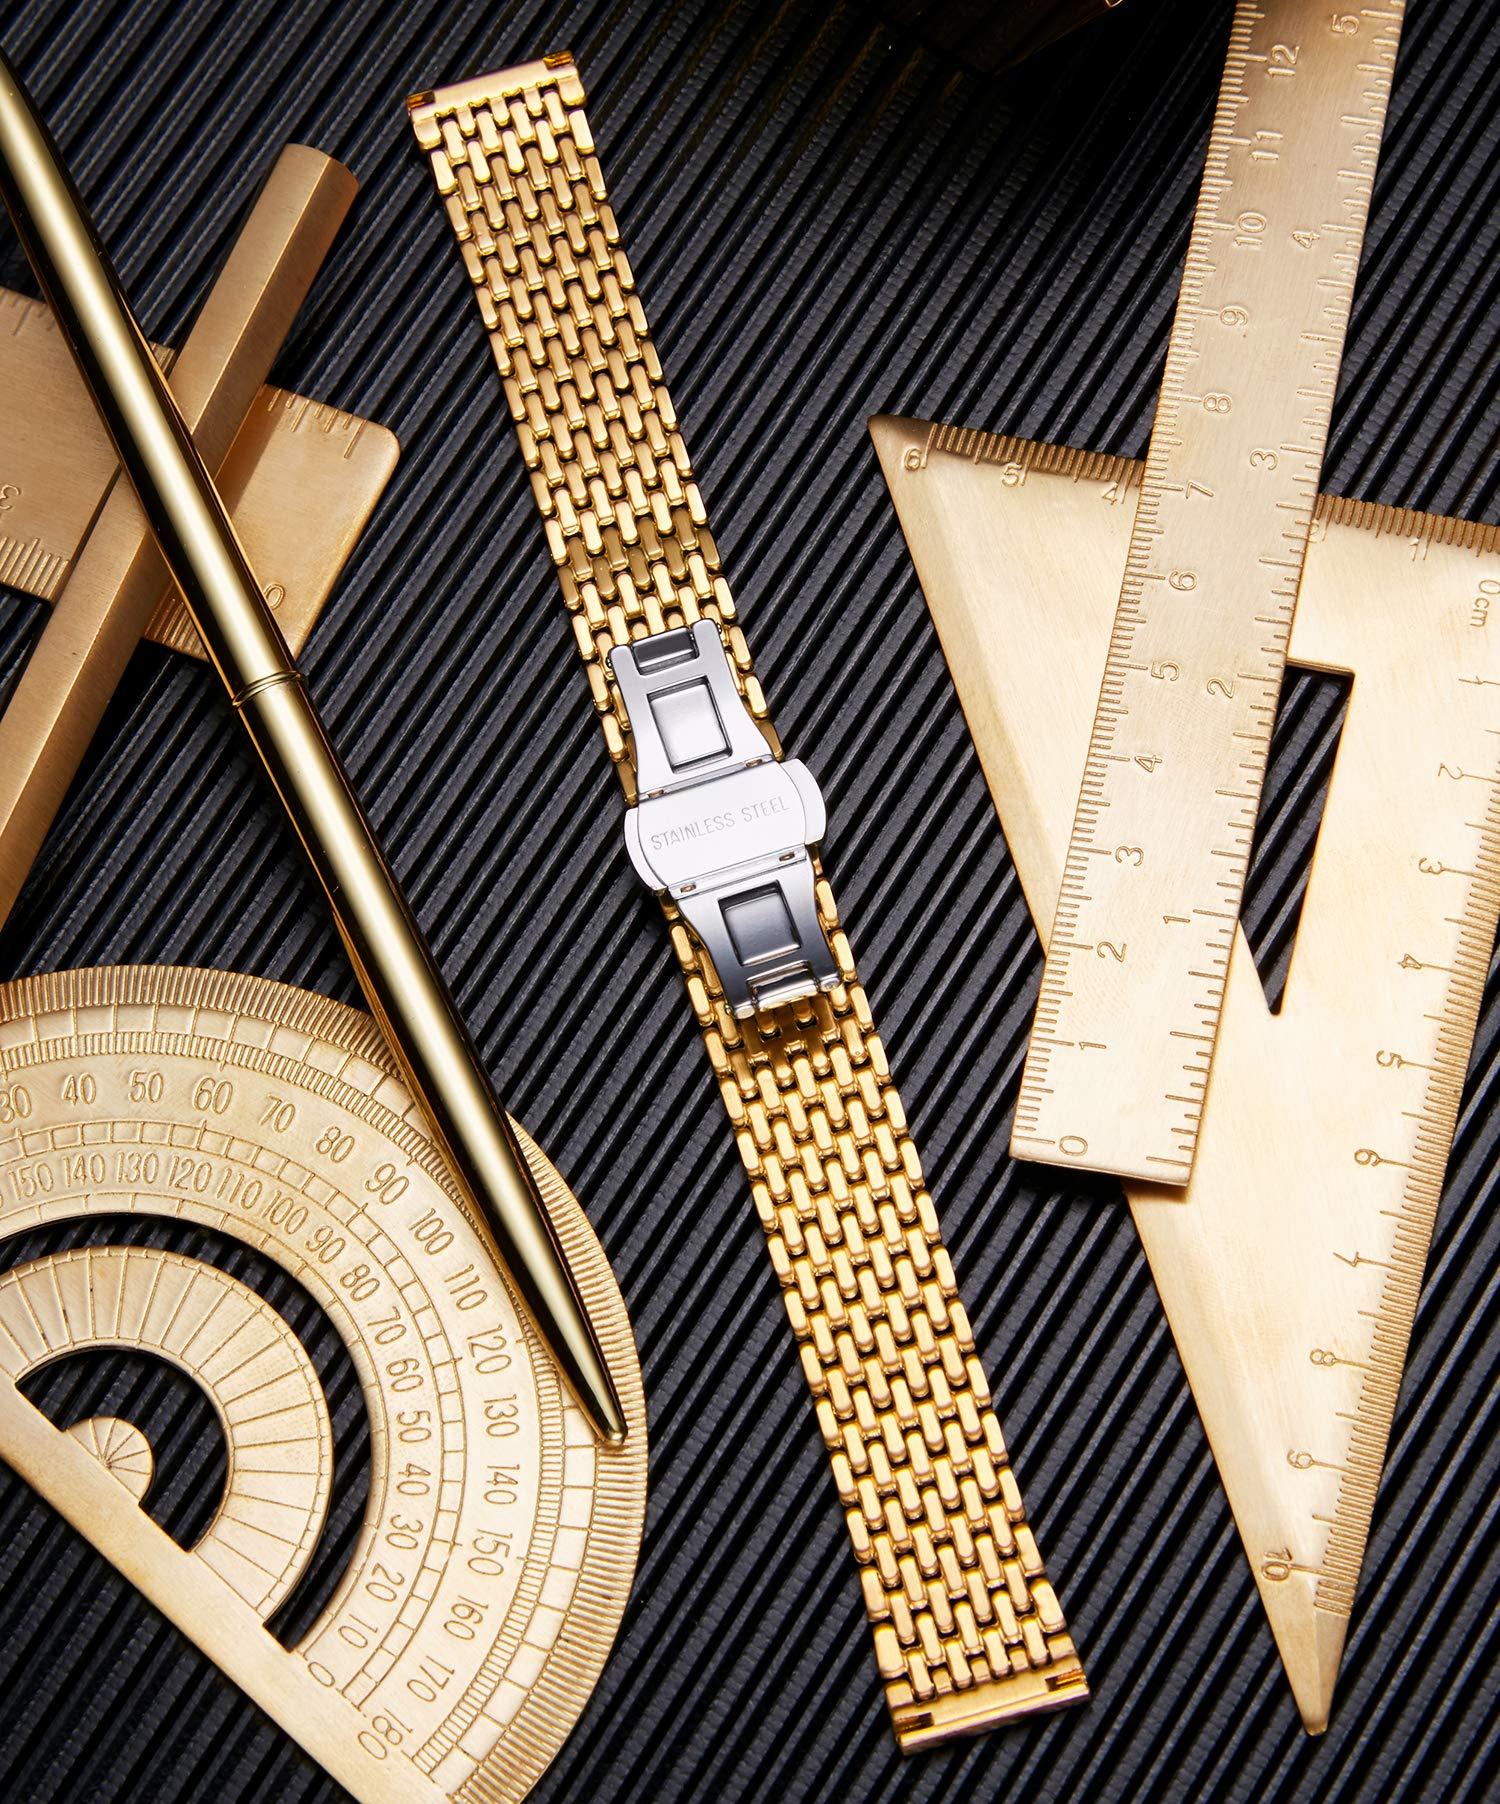 BINLUN-Thin-Mesh-Edelstahl-Uhrenarmbnder-Light-Ersatz-Uhrenarmband-Poliertes-Armband-fr-Herren-Damenuhr-12mm-14mm-16mm-18mm-20mm-22mm-mit-Butterfly-Schnalle